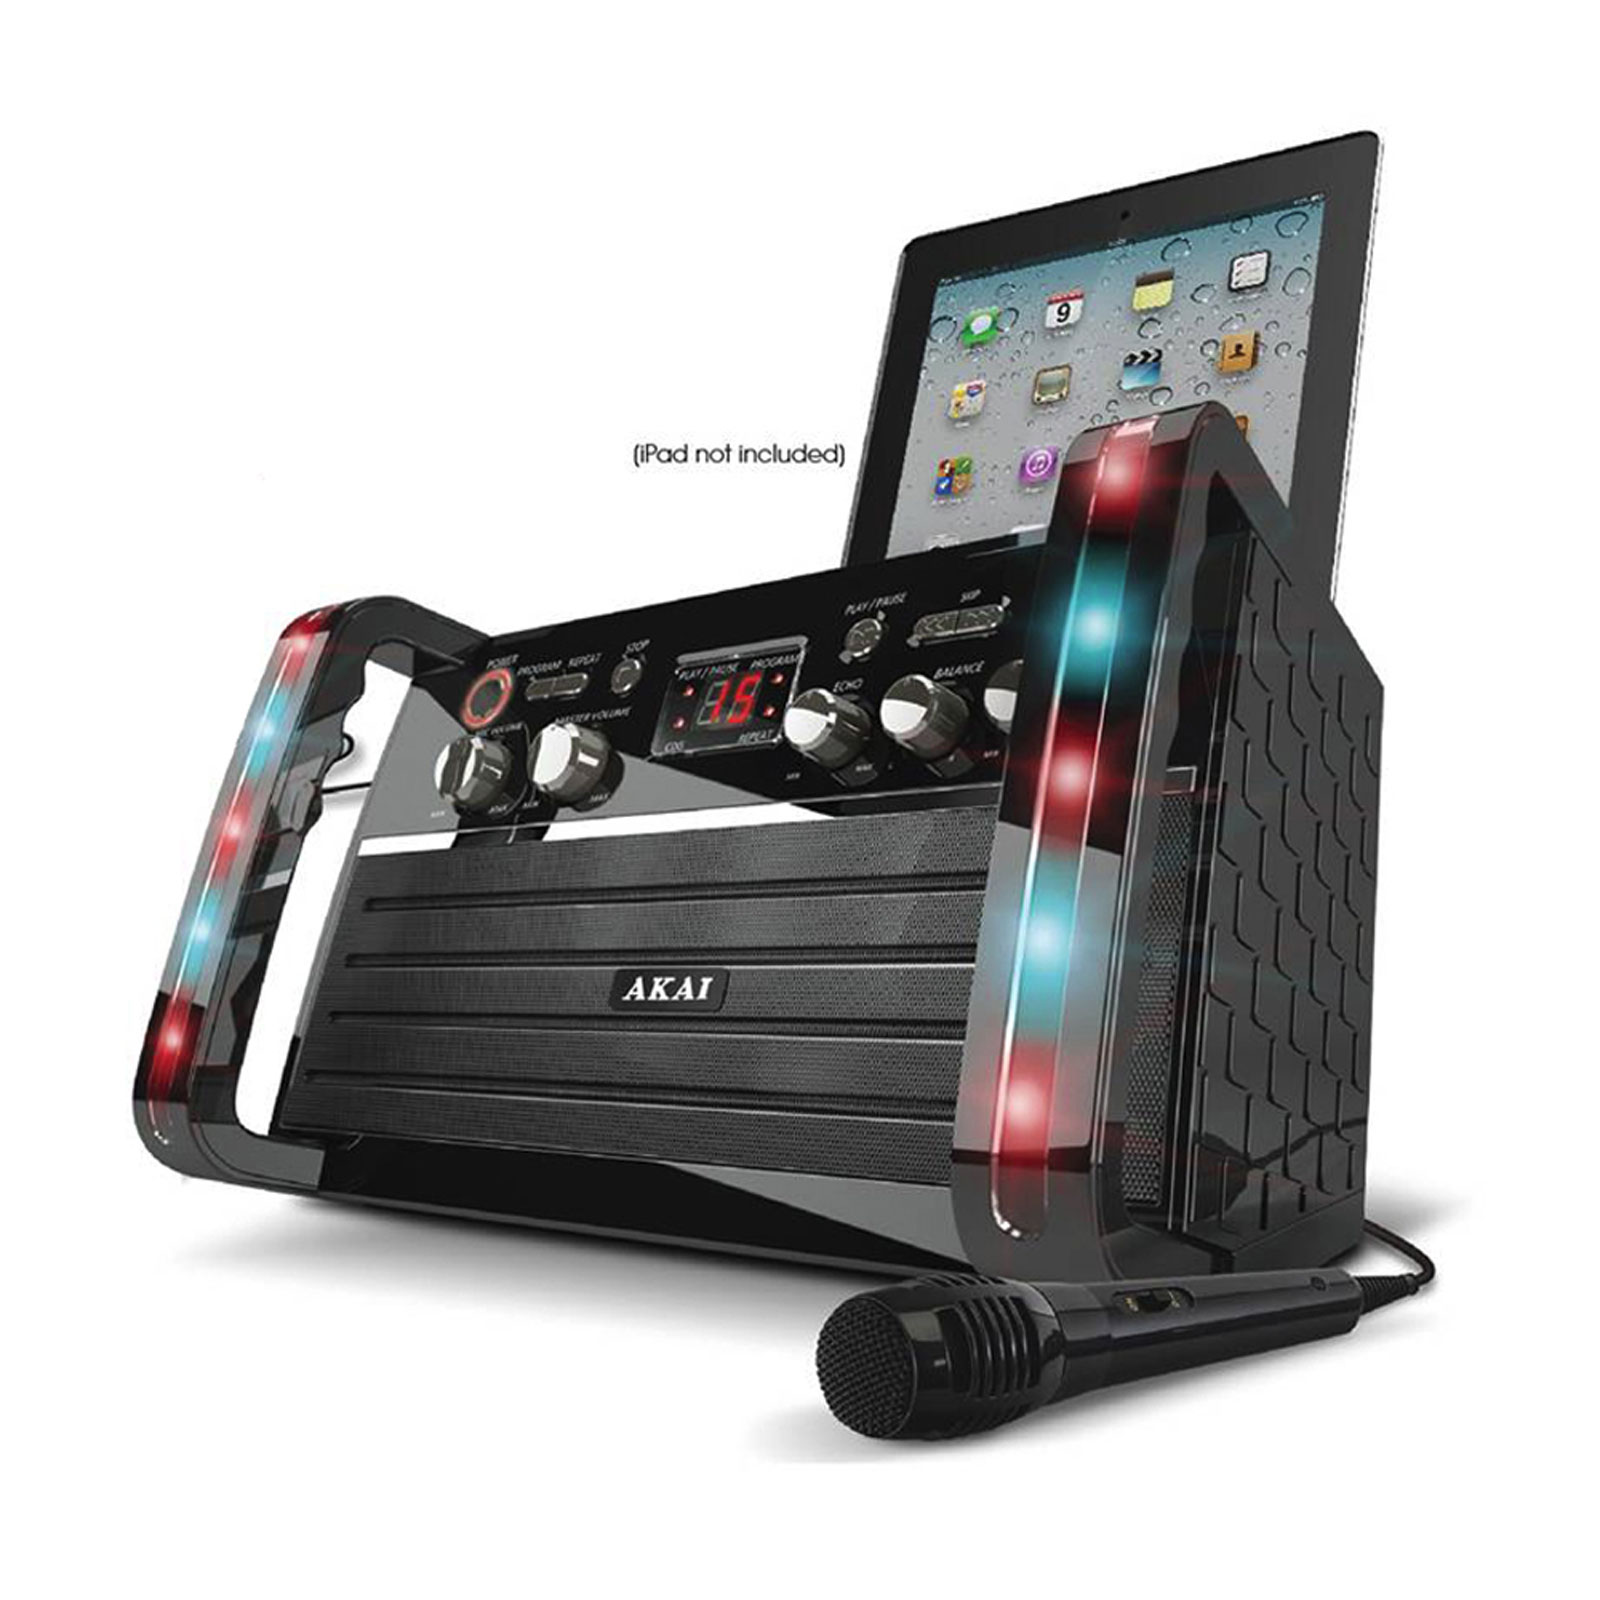 Akai CDG Portable Karaoke System with iPad Cradle and Line Input